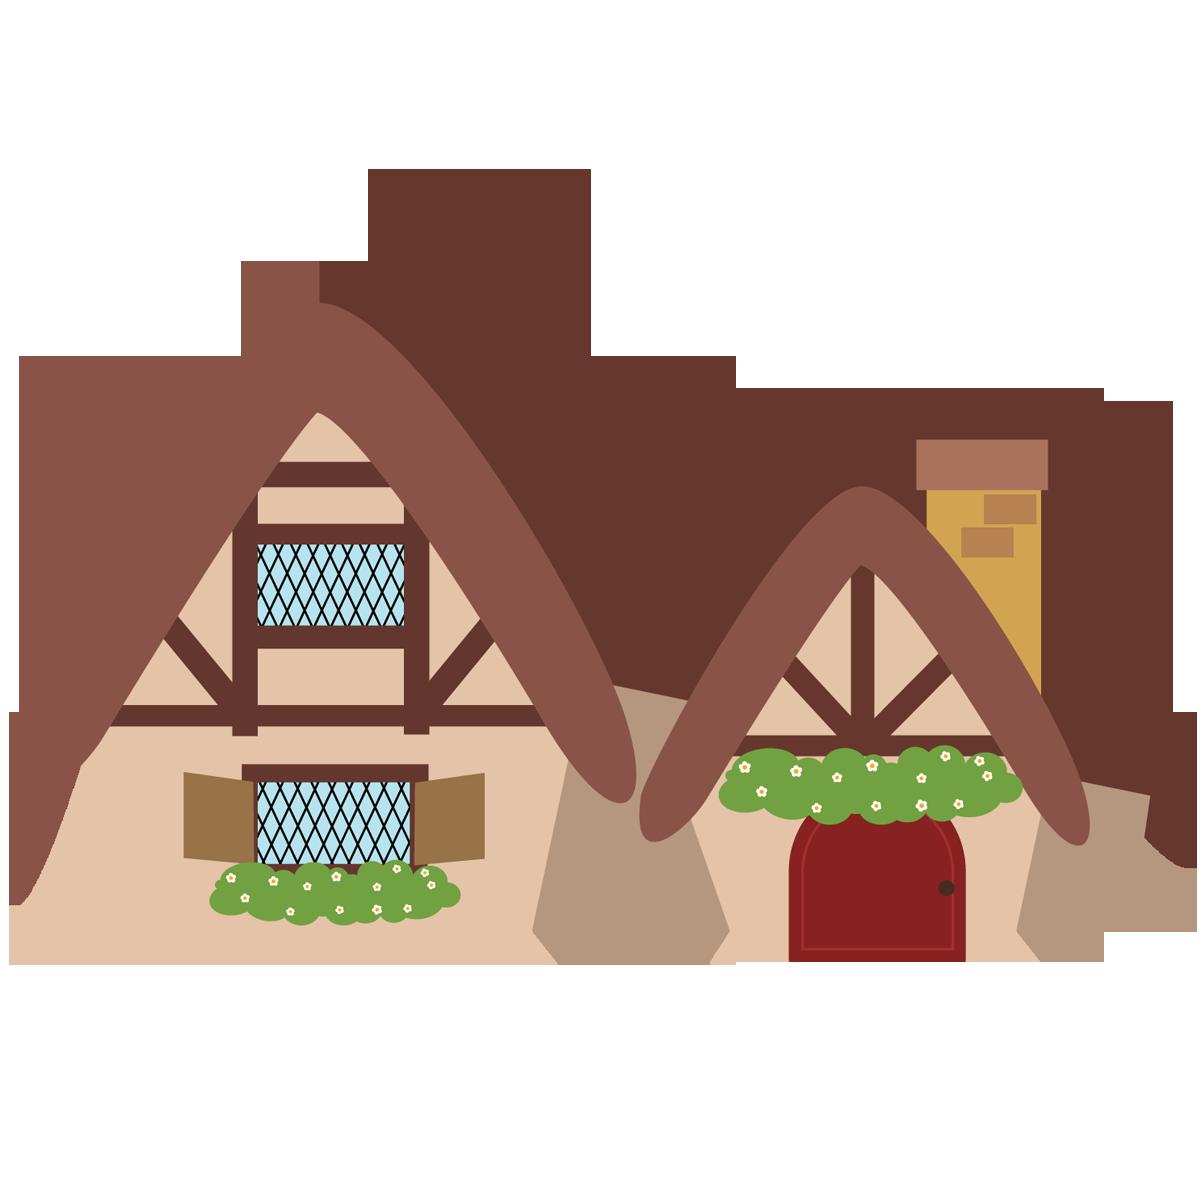 Branca De Neve Cute Casa Sete Anões 03